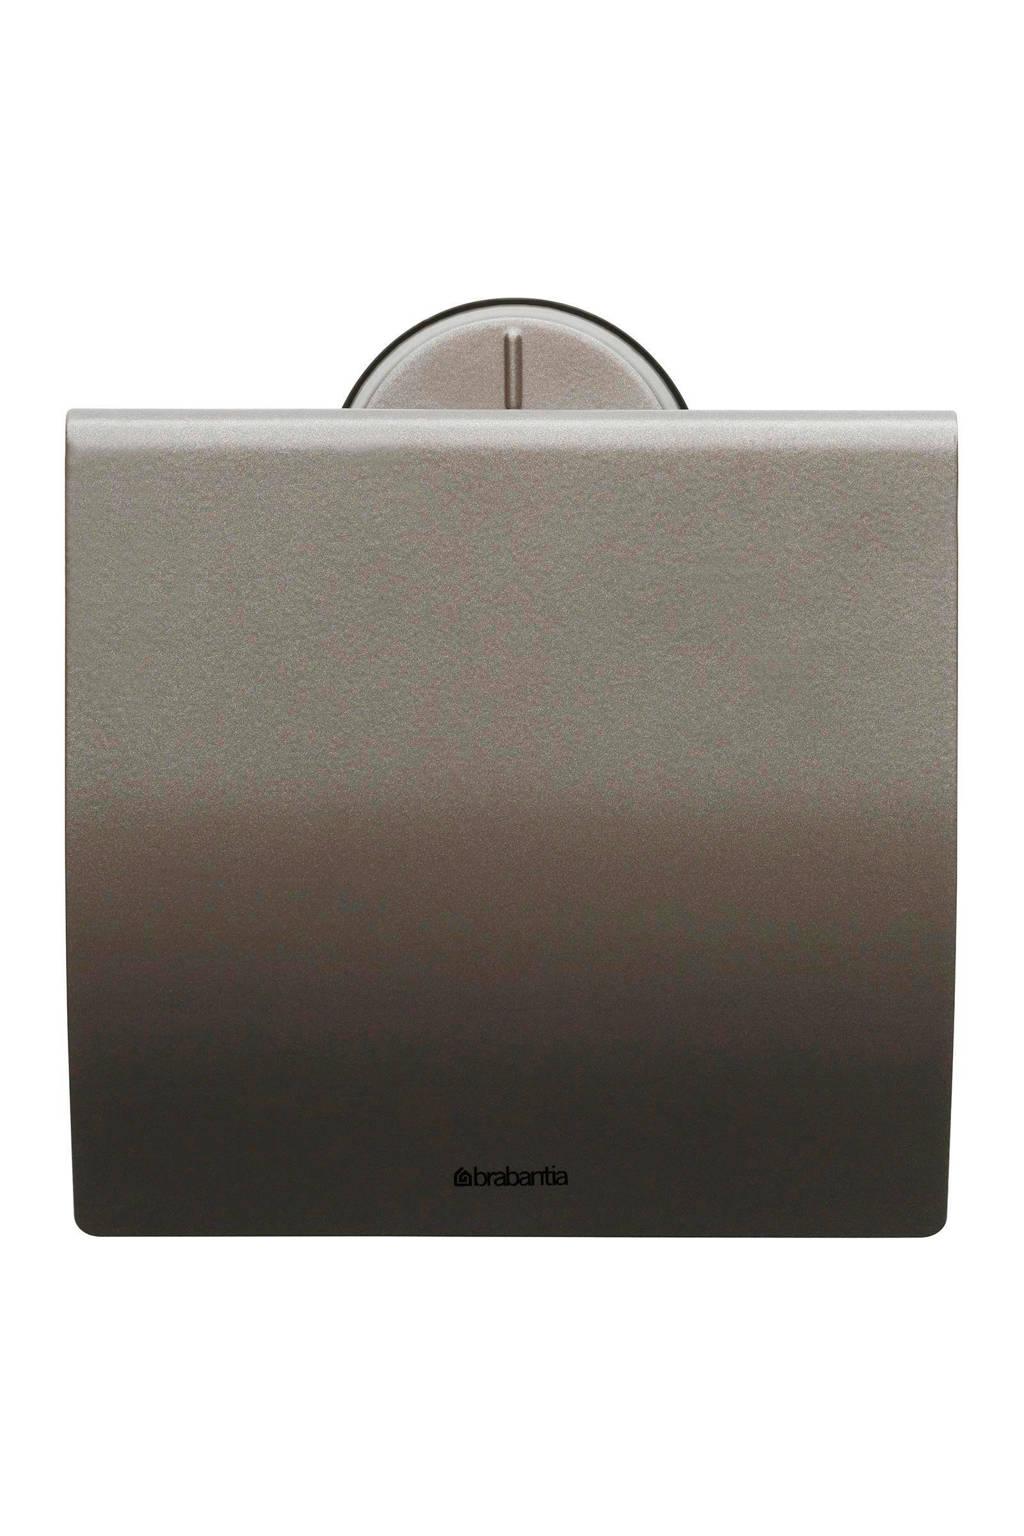 Brabantia toiletrolhouder met klep, RVS platinum